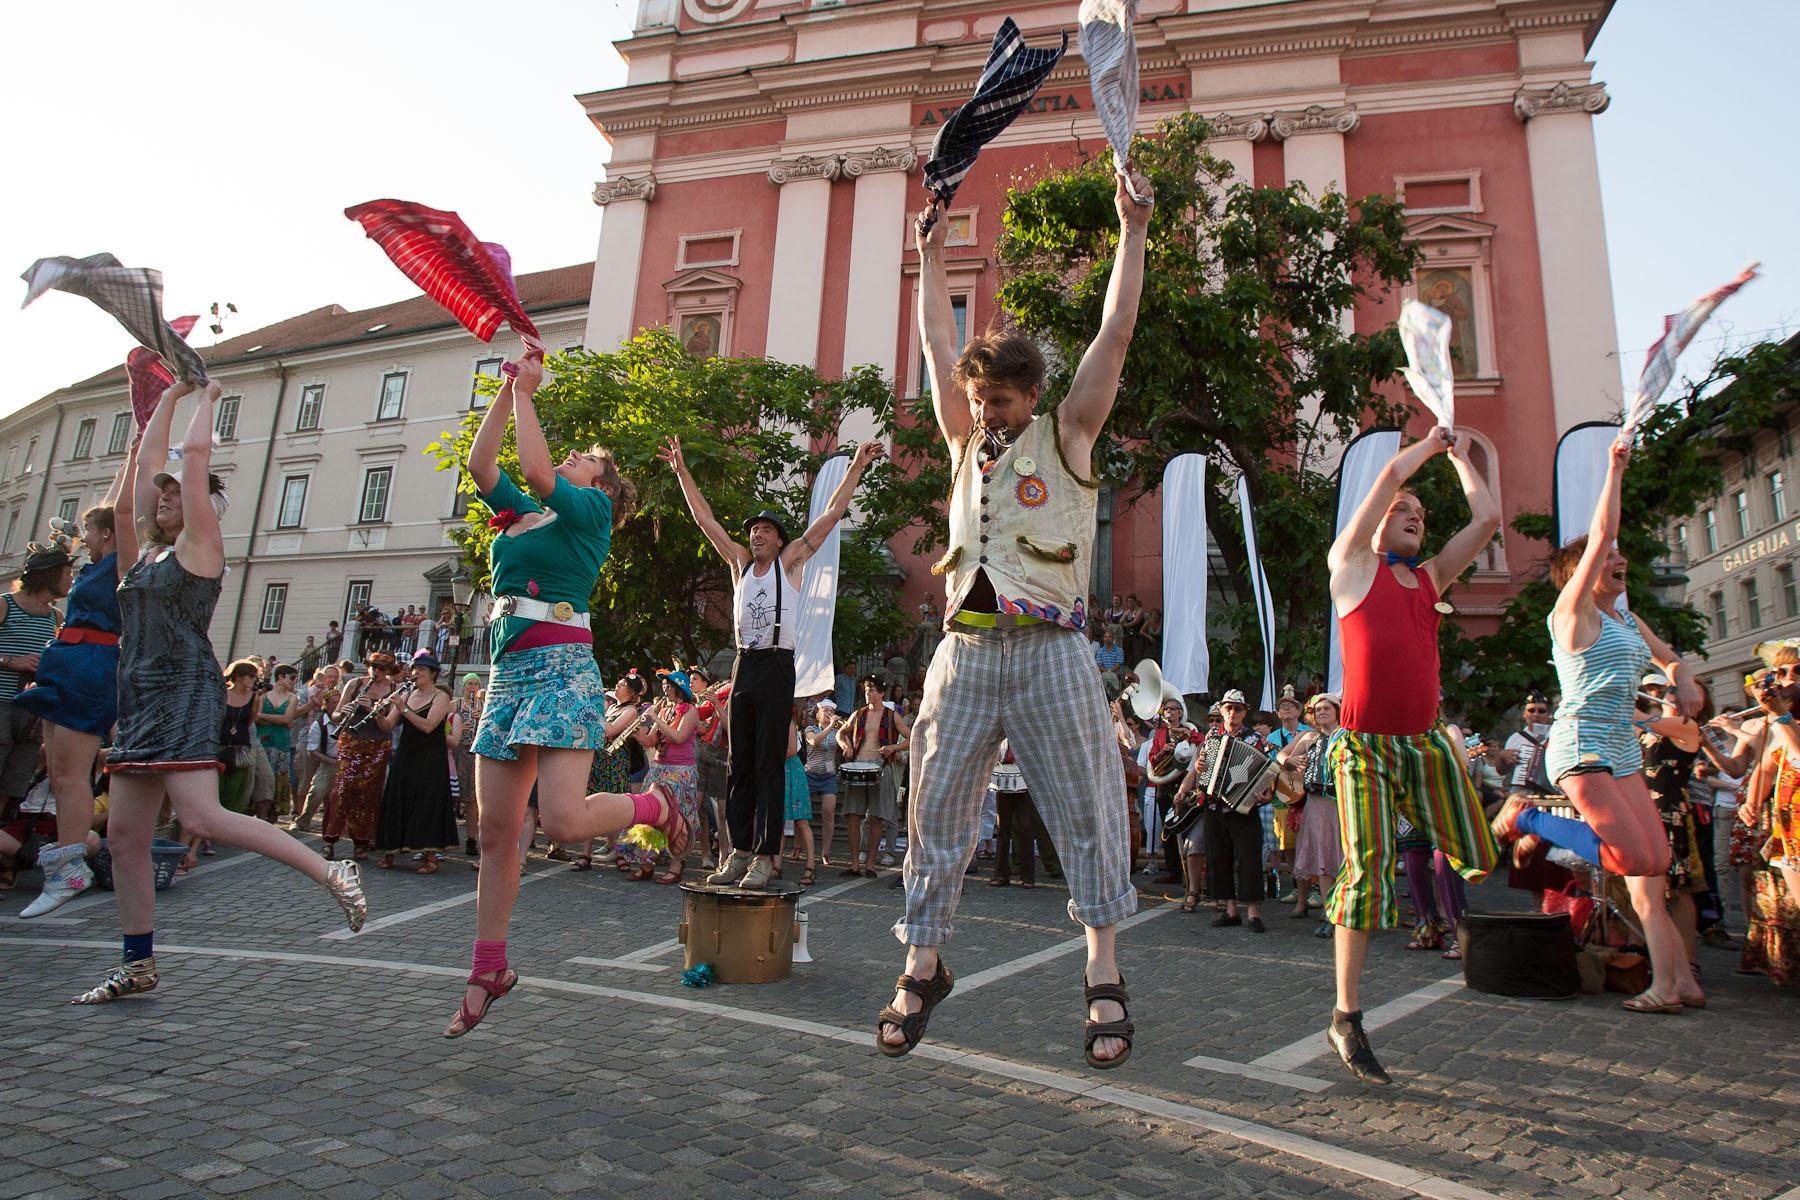 Bij' De Vieze Gasten (Belgium) perform during the Ana Desetnica international street arts festival in Ljubljana, Slovenia, Jun 30 2012.